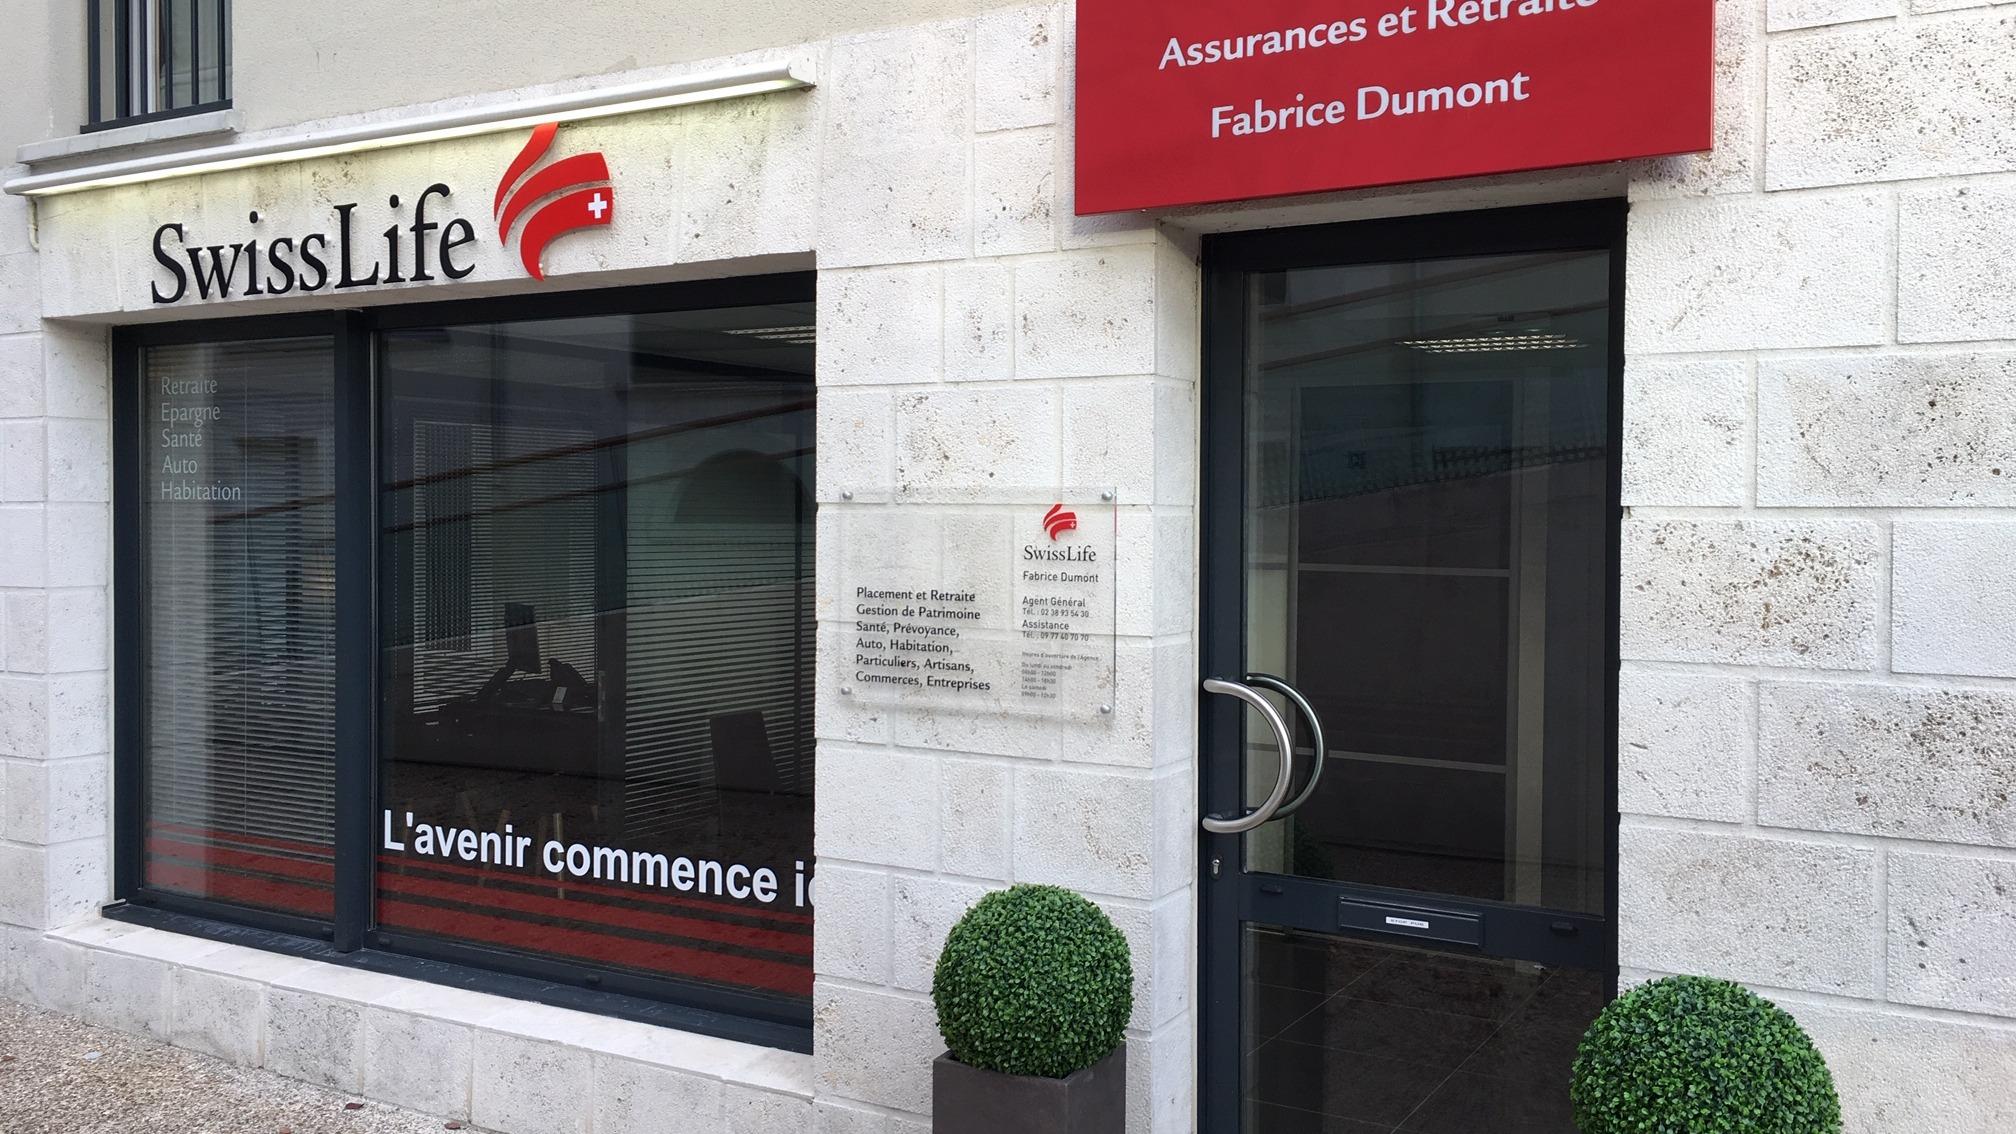 Agence Fabrice Dumont